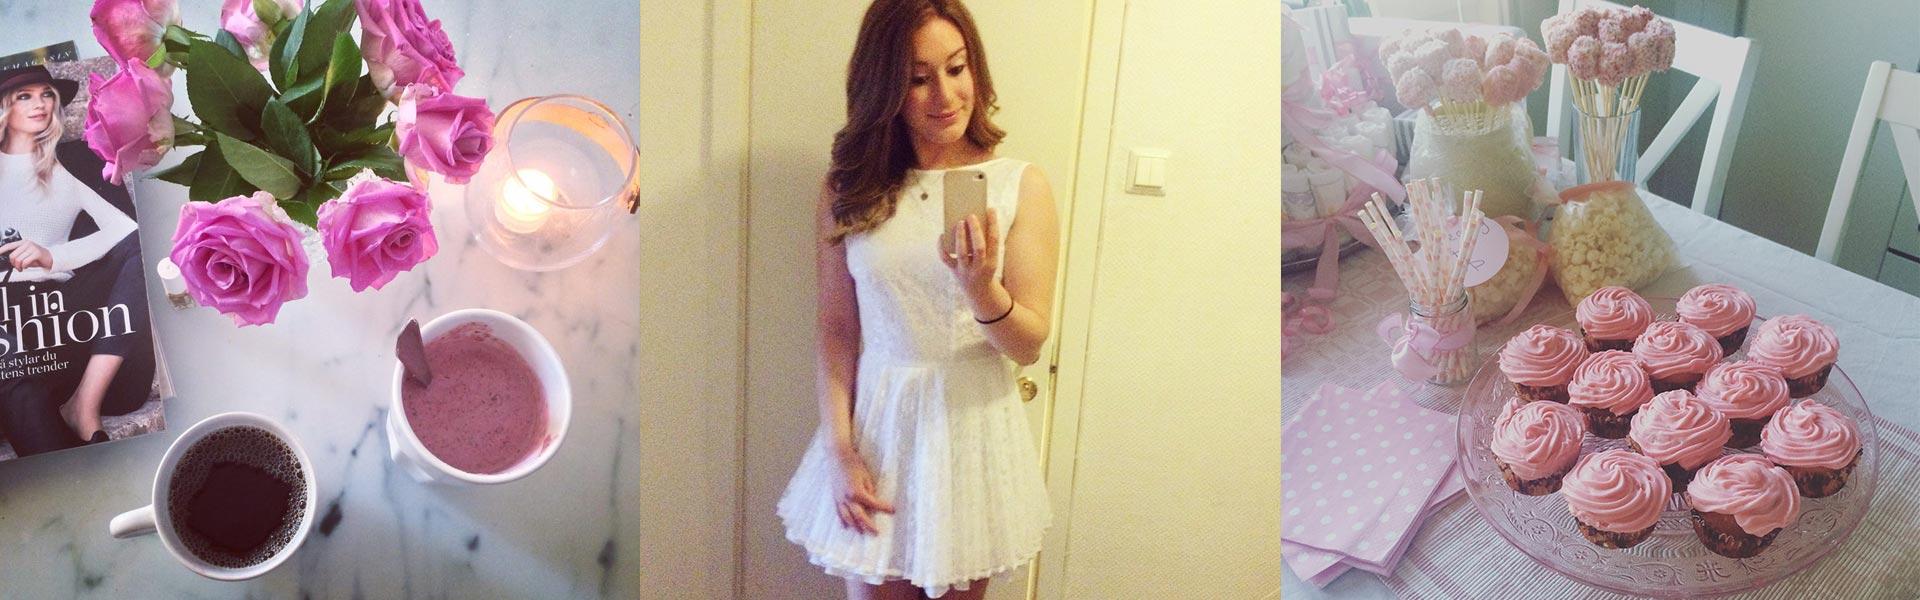 Linas Blogg